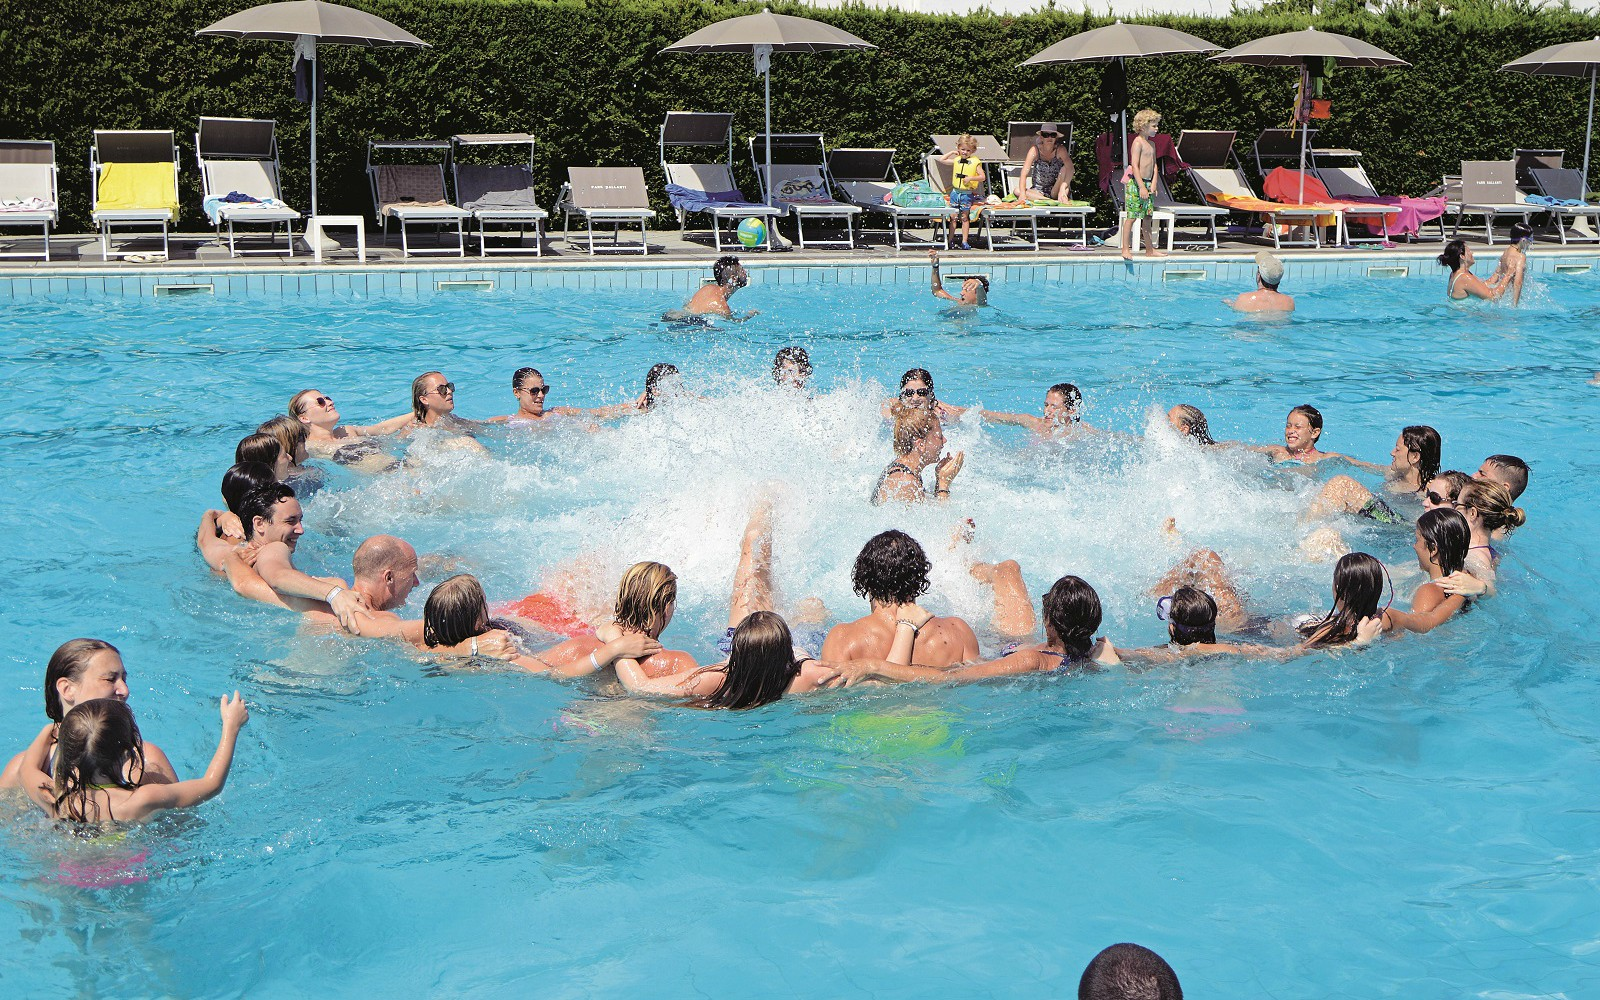 05-Sport-Watergym-Park-Gallanti